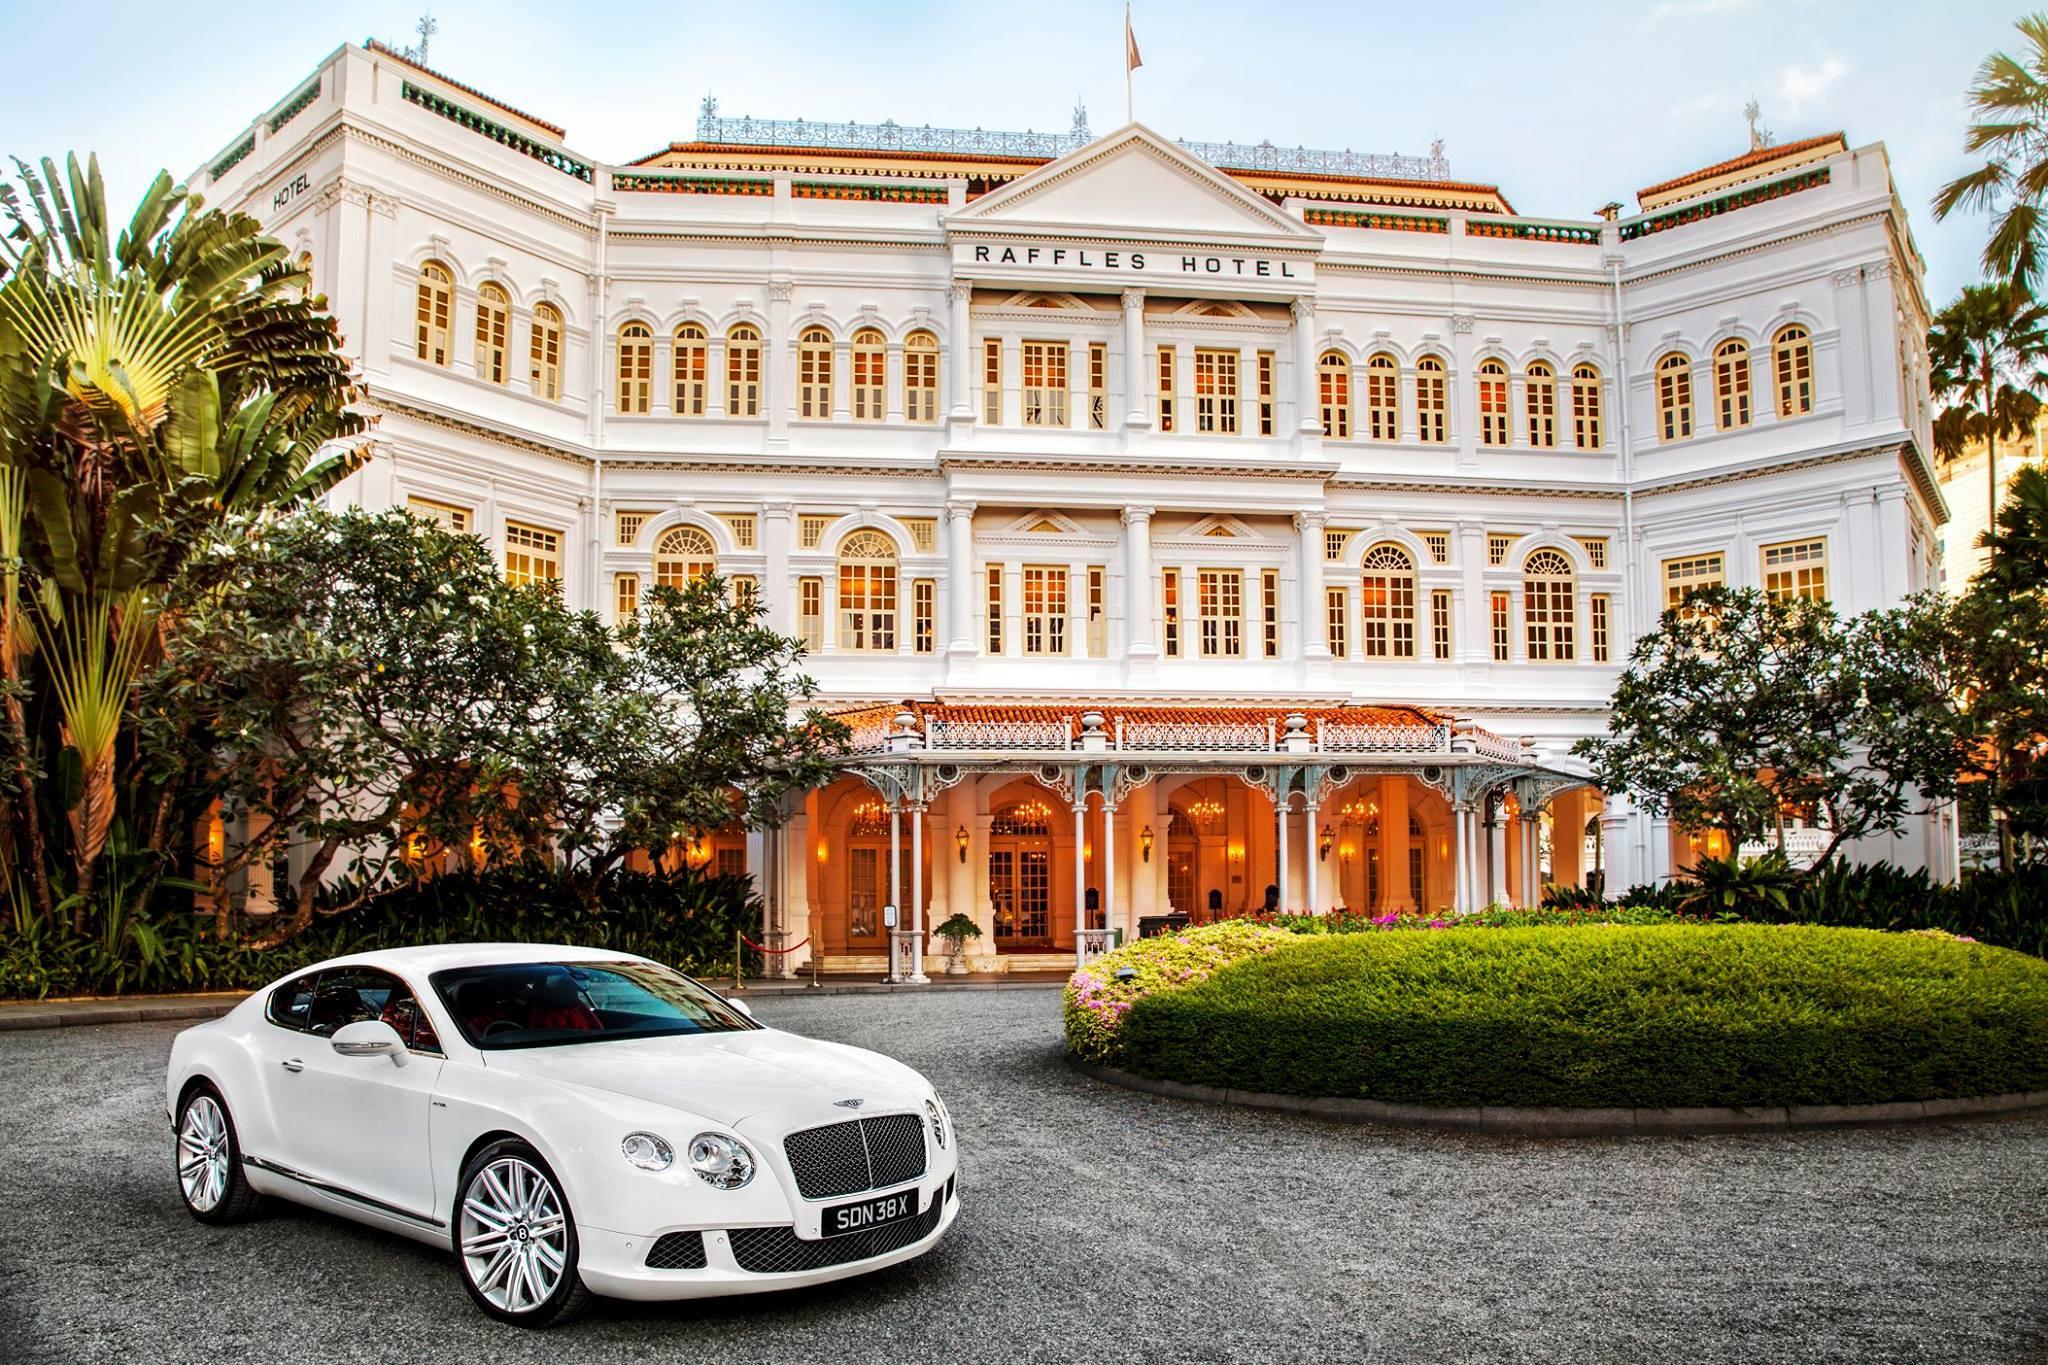 Raffles hotel singapore facilities for Raffles hotel singapore swimming pool